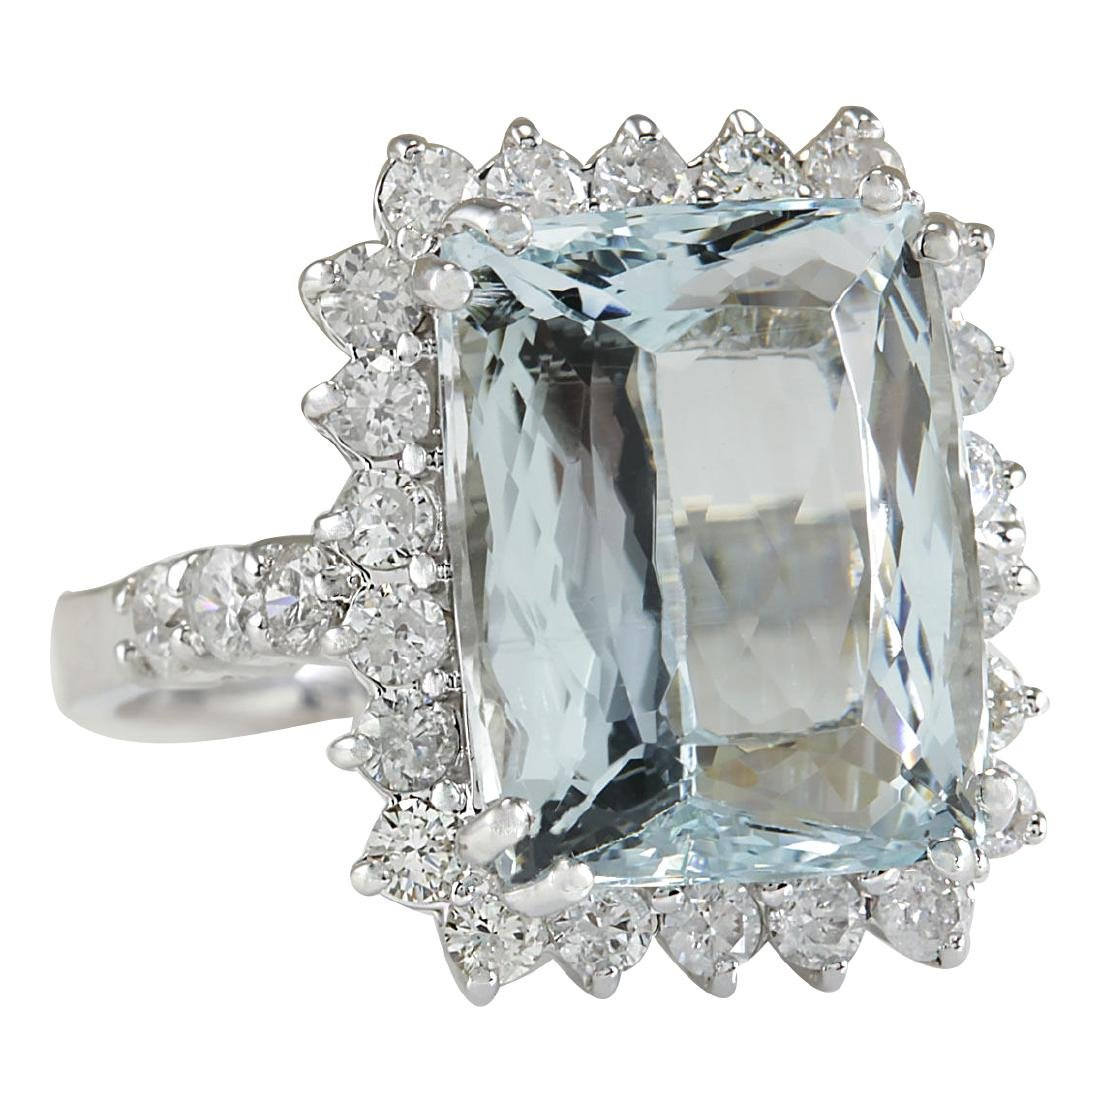 10.55CTW Natural Aquamarine And Diamond Ring In 18K - 2